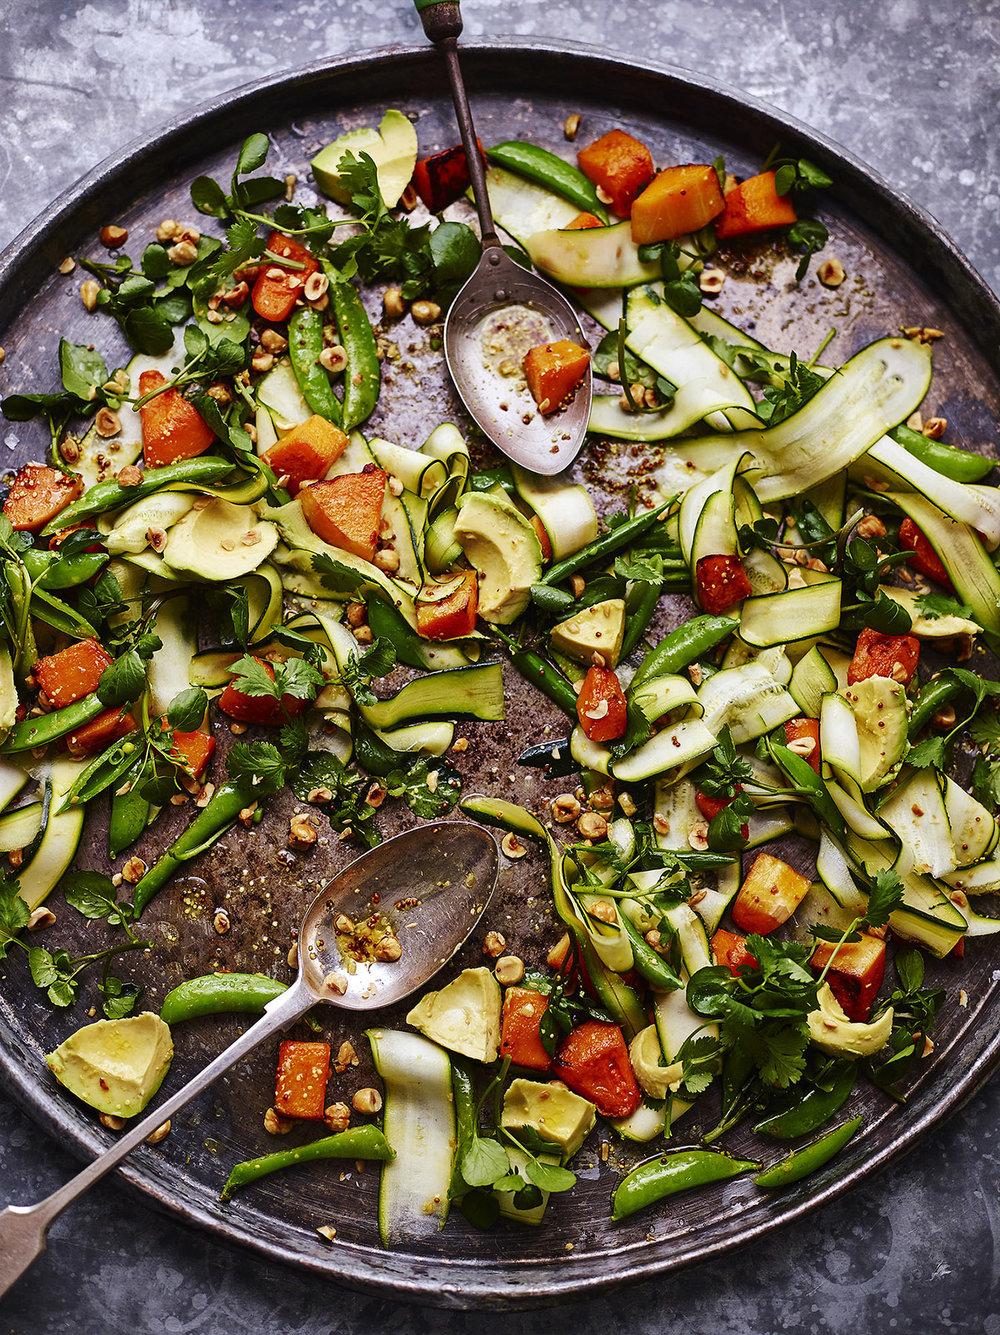 squash_ornage_hazlenuts_salad.jpg